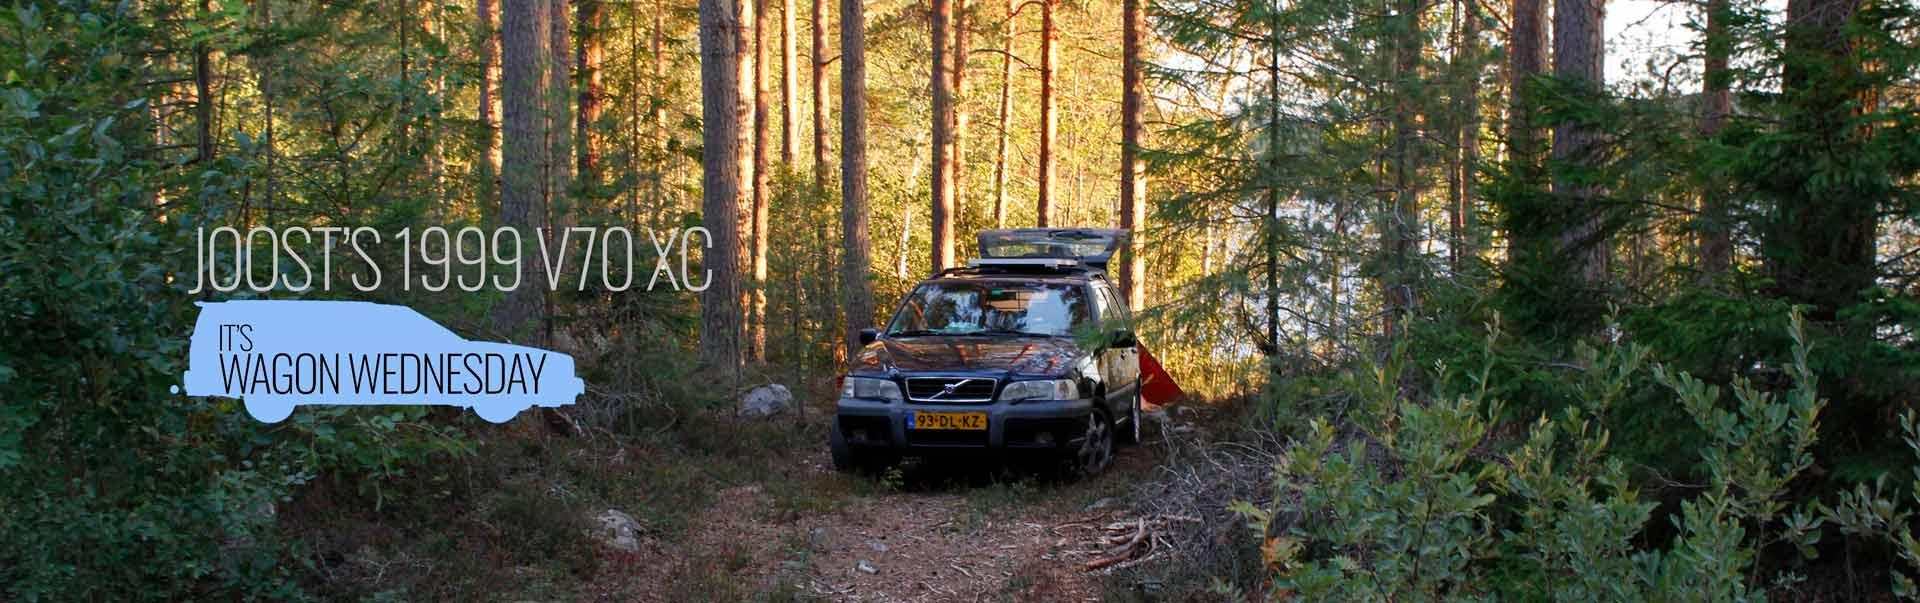 Joost 1999 V70 XC Camping4 -